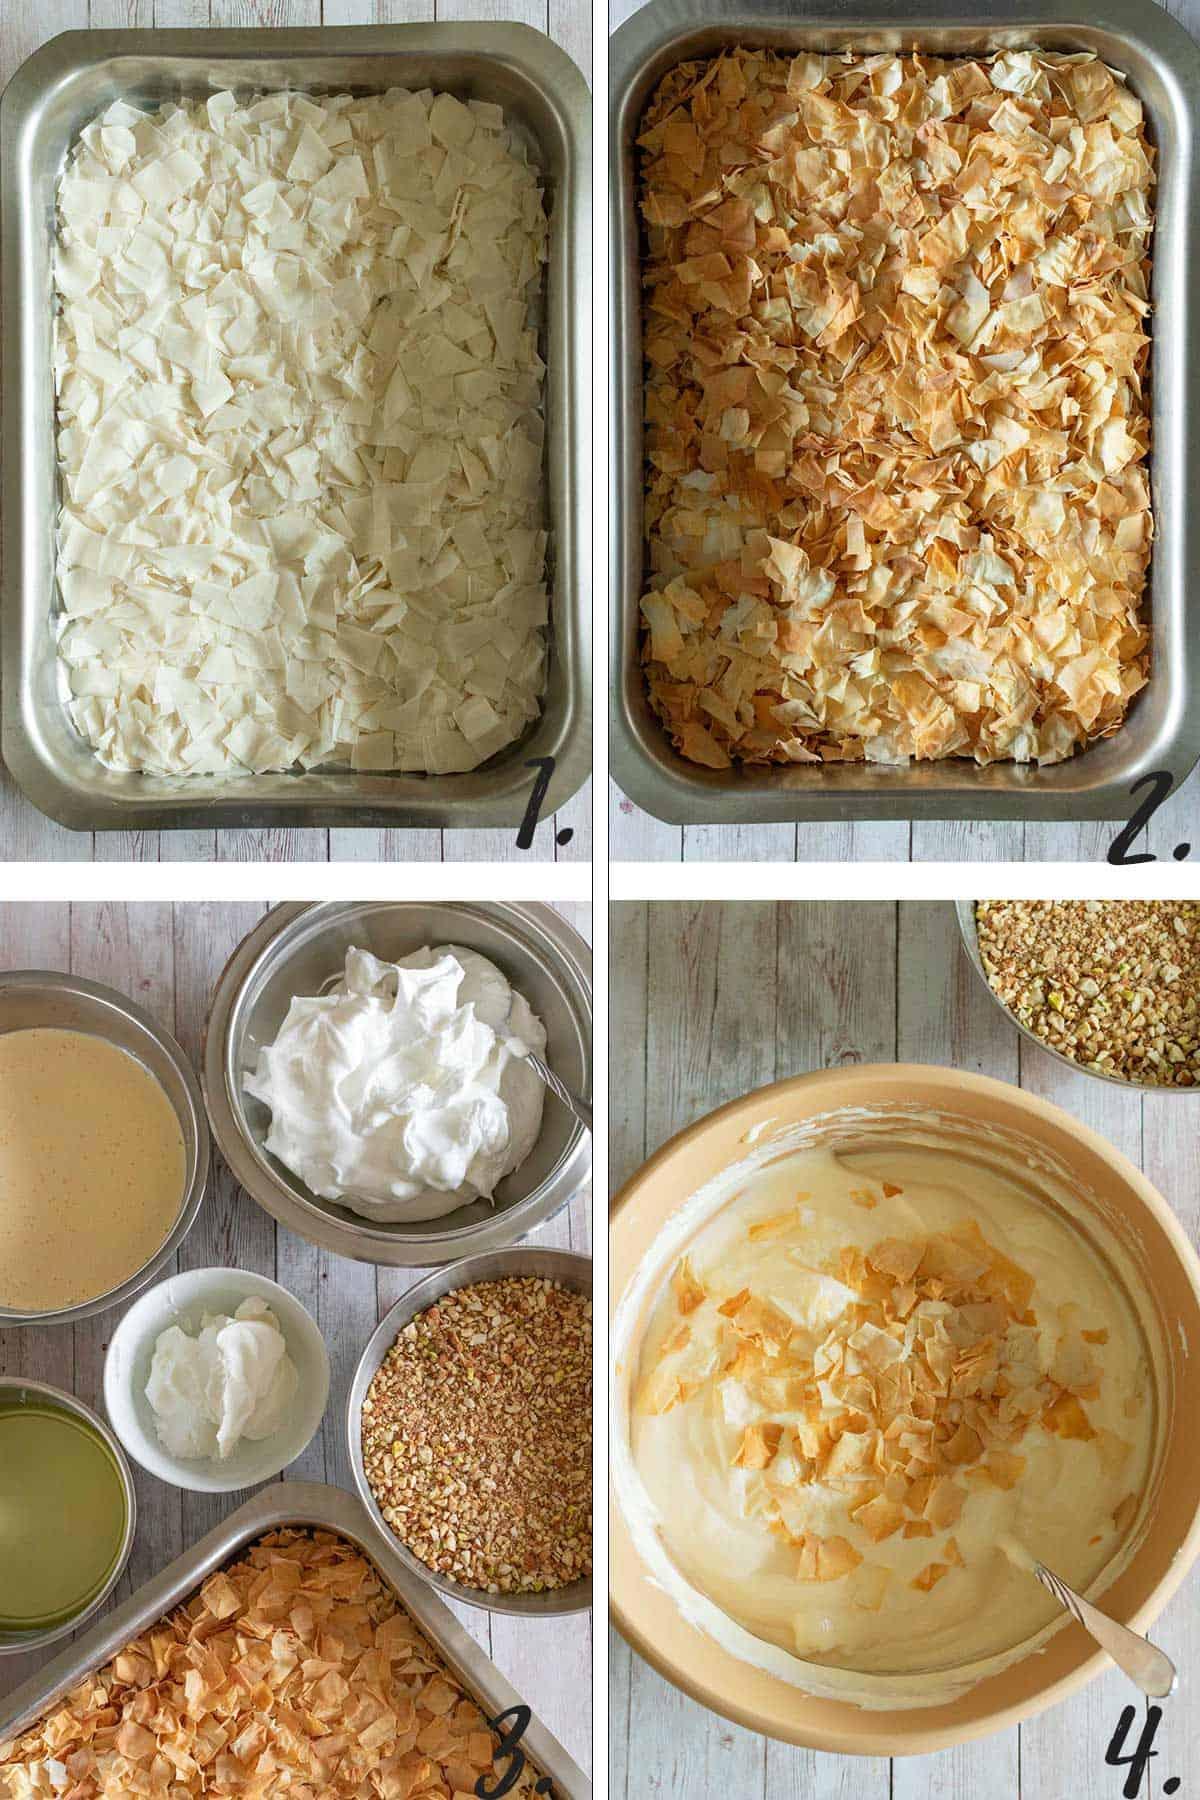 How To Make Cheesecake Baklava